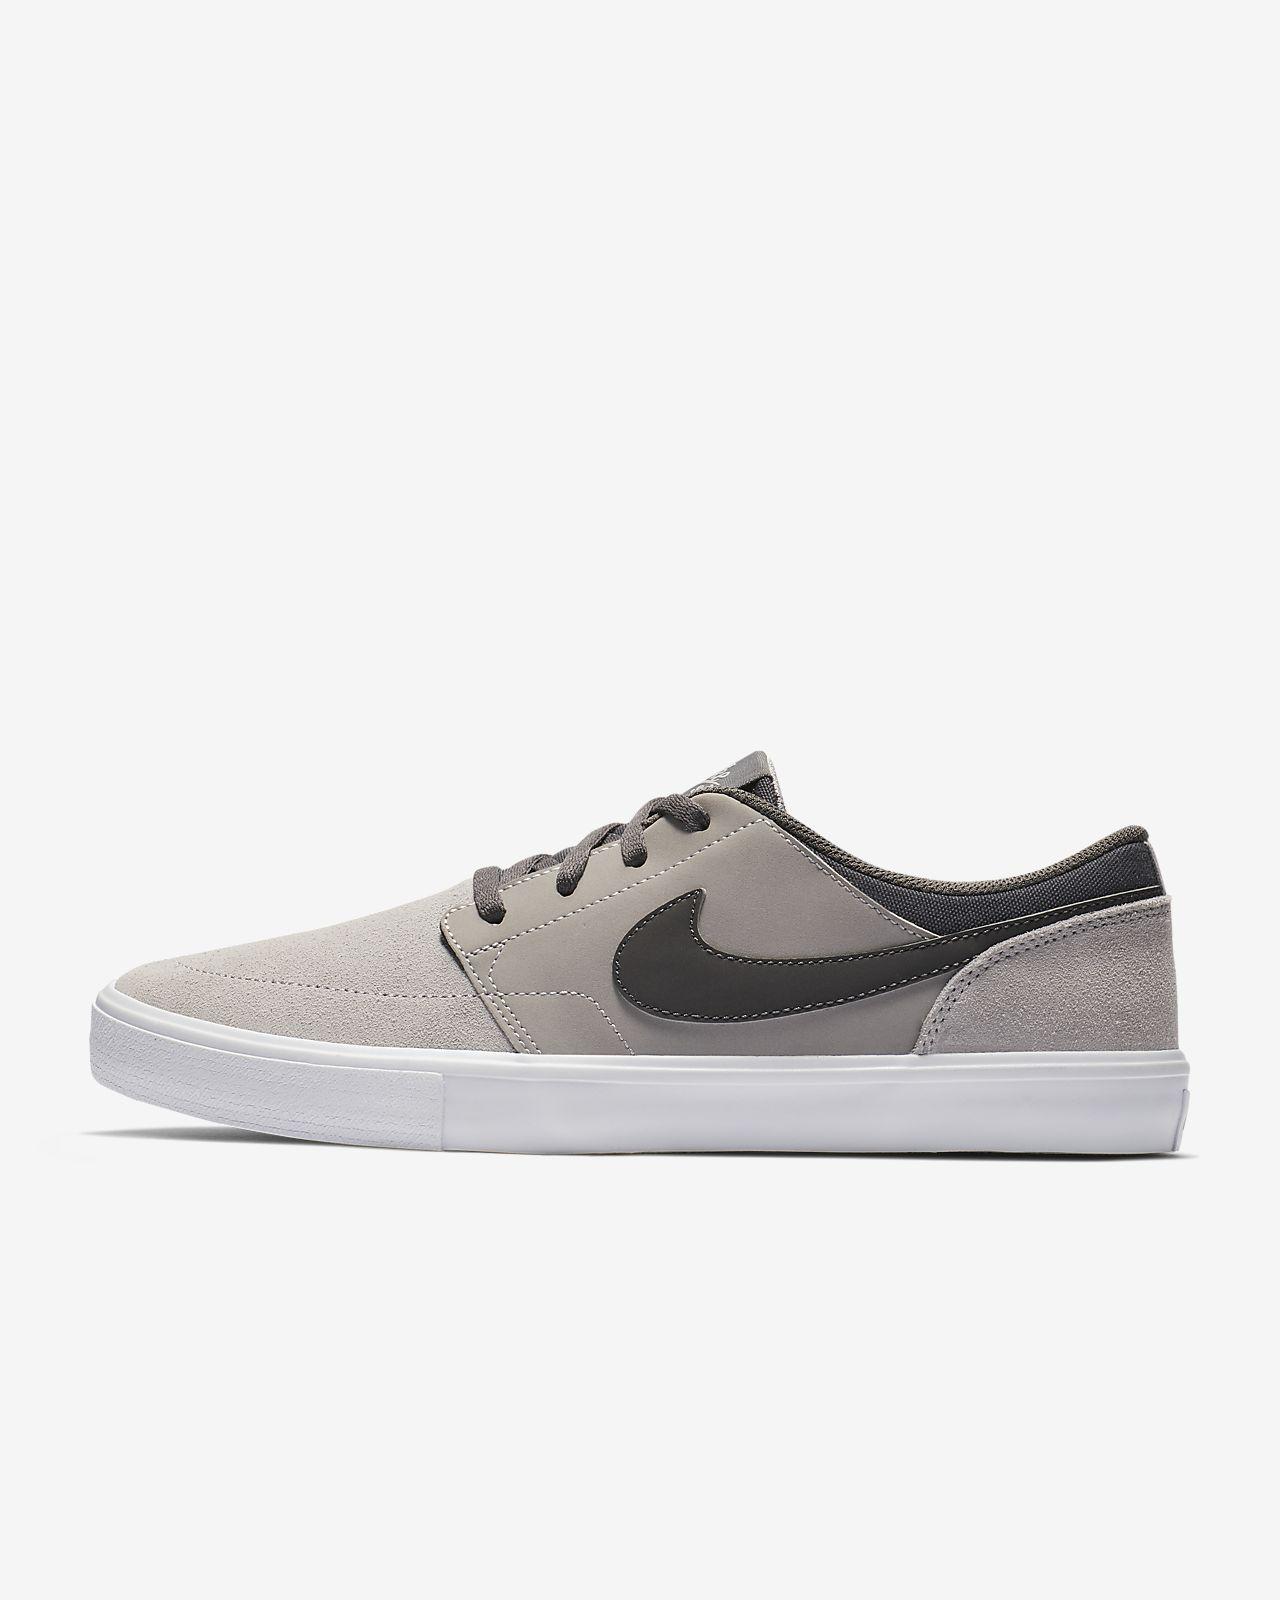 Portmore Scarpa Uomo Sb Nike Skateboard Da Ii It Solarsoft wSxrSXgq